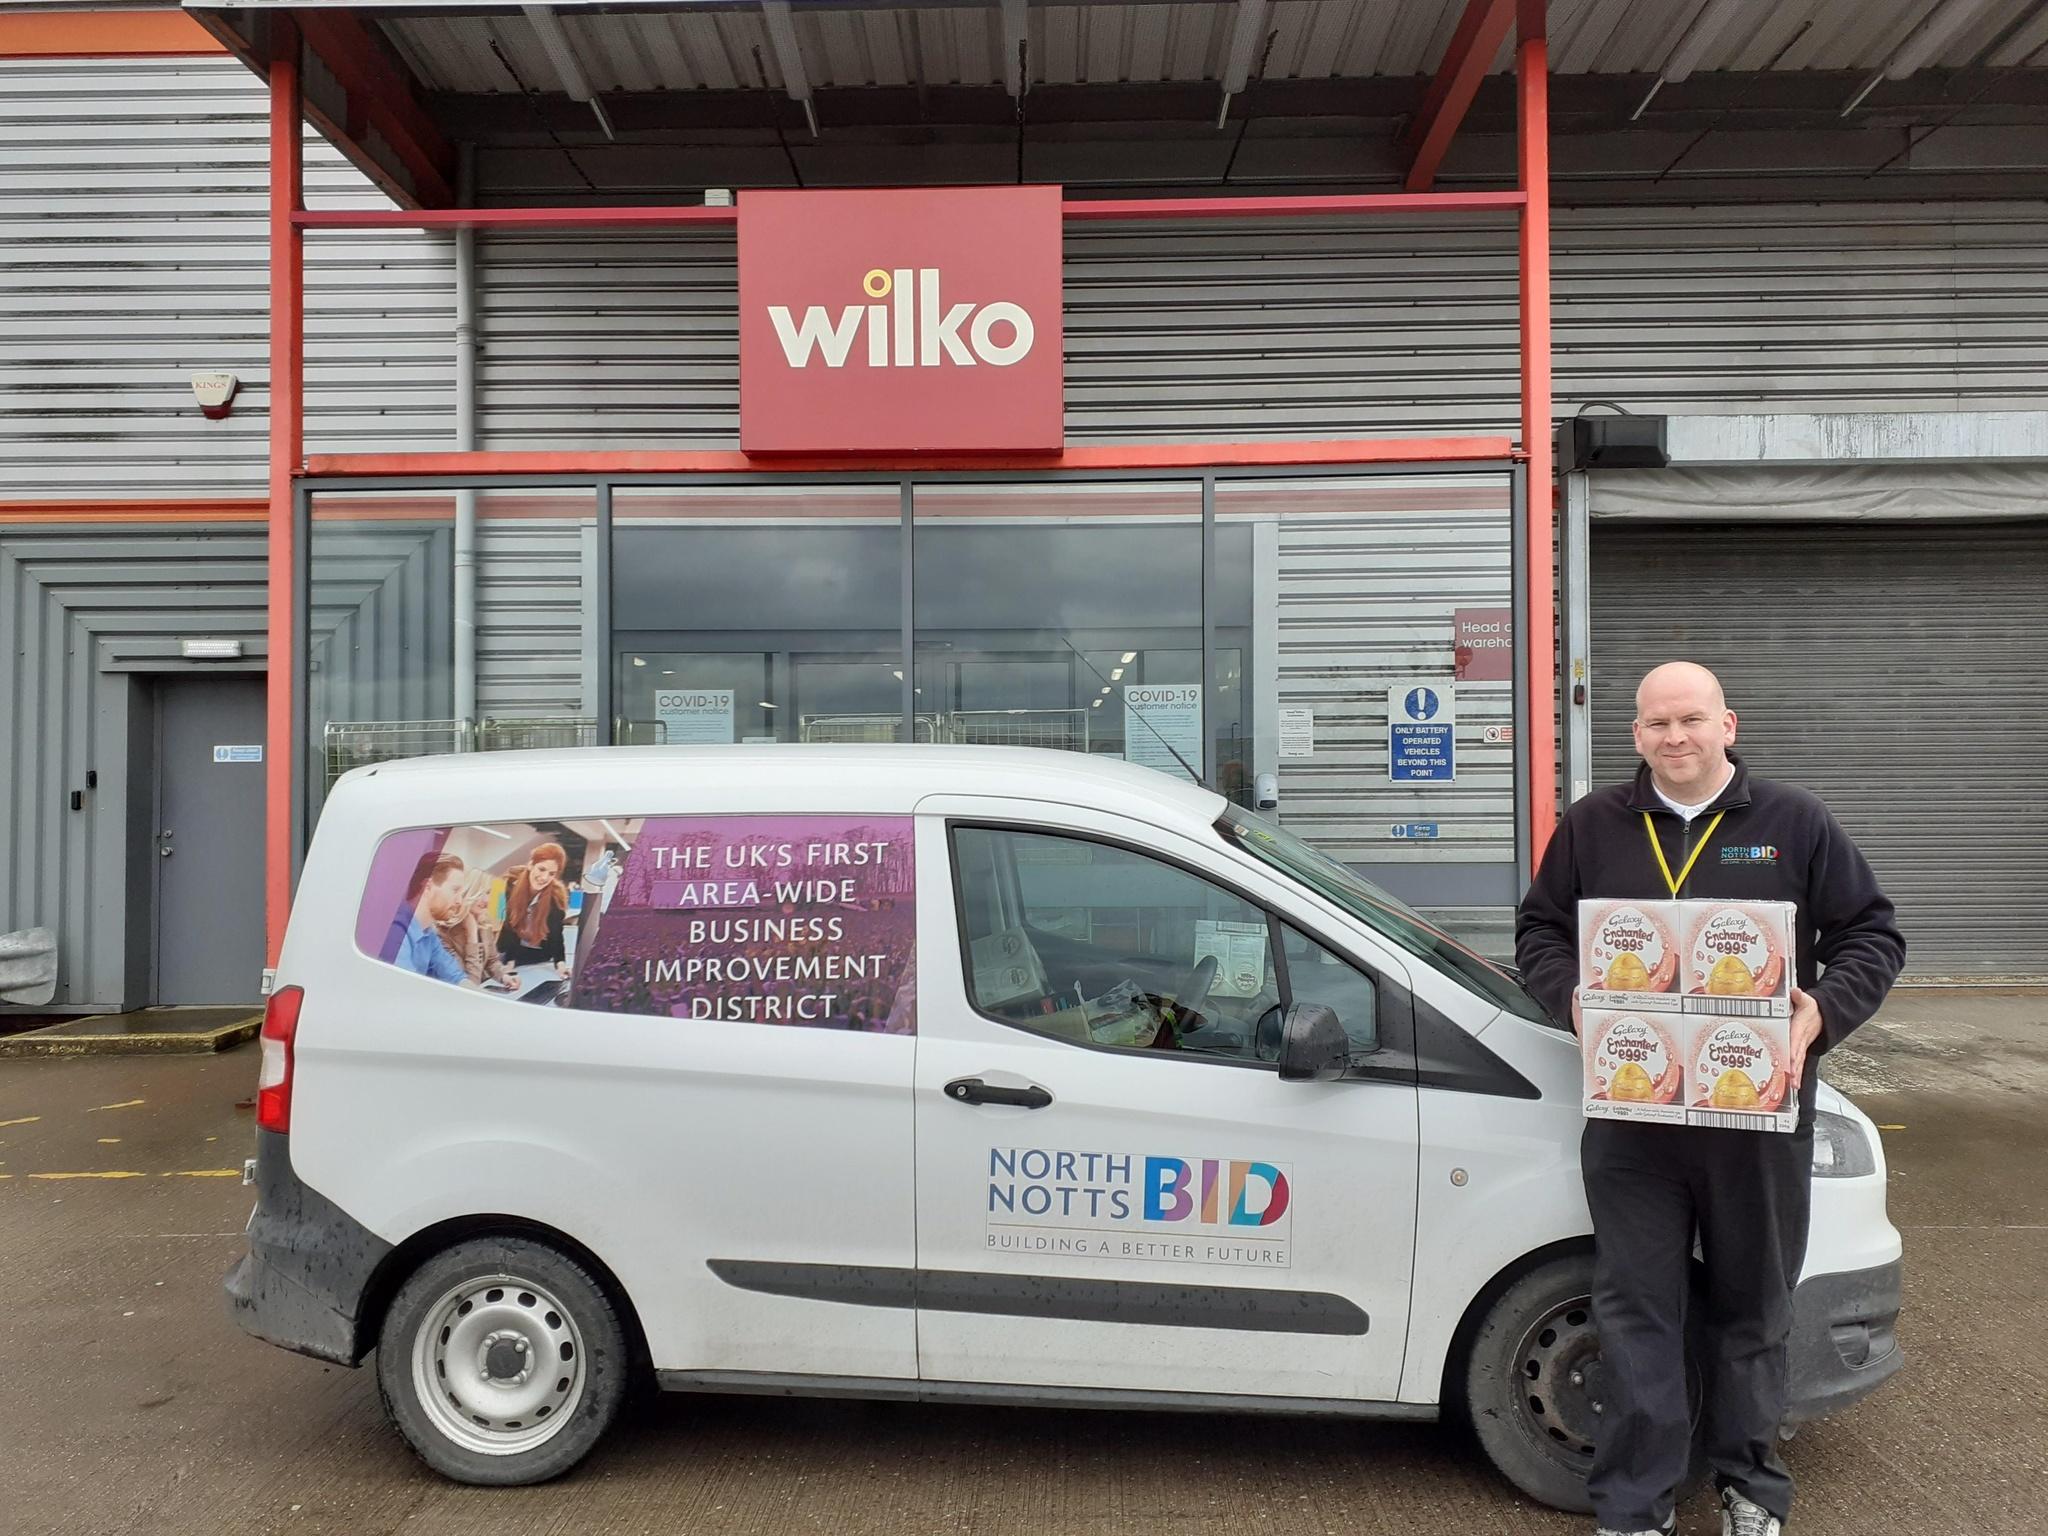 North Notts BidAnd WilkoDeliverEssential Supplies To LocalCommunity Groups